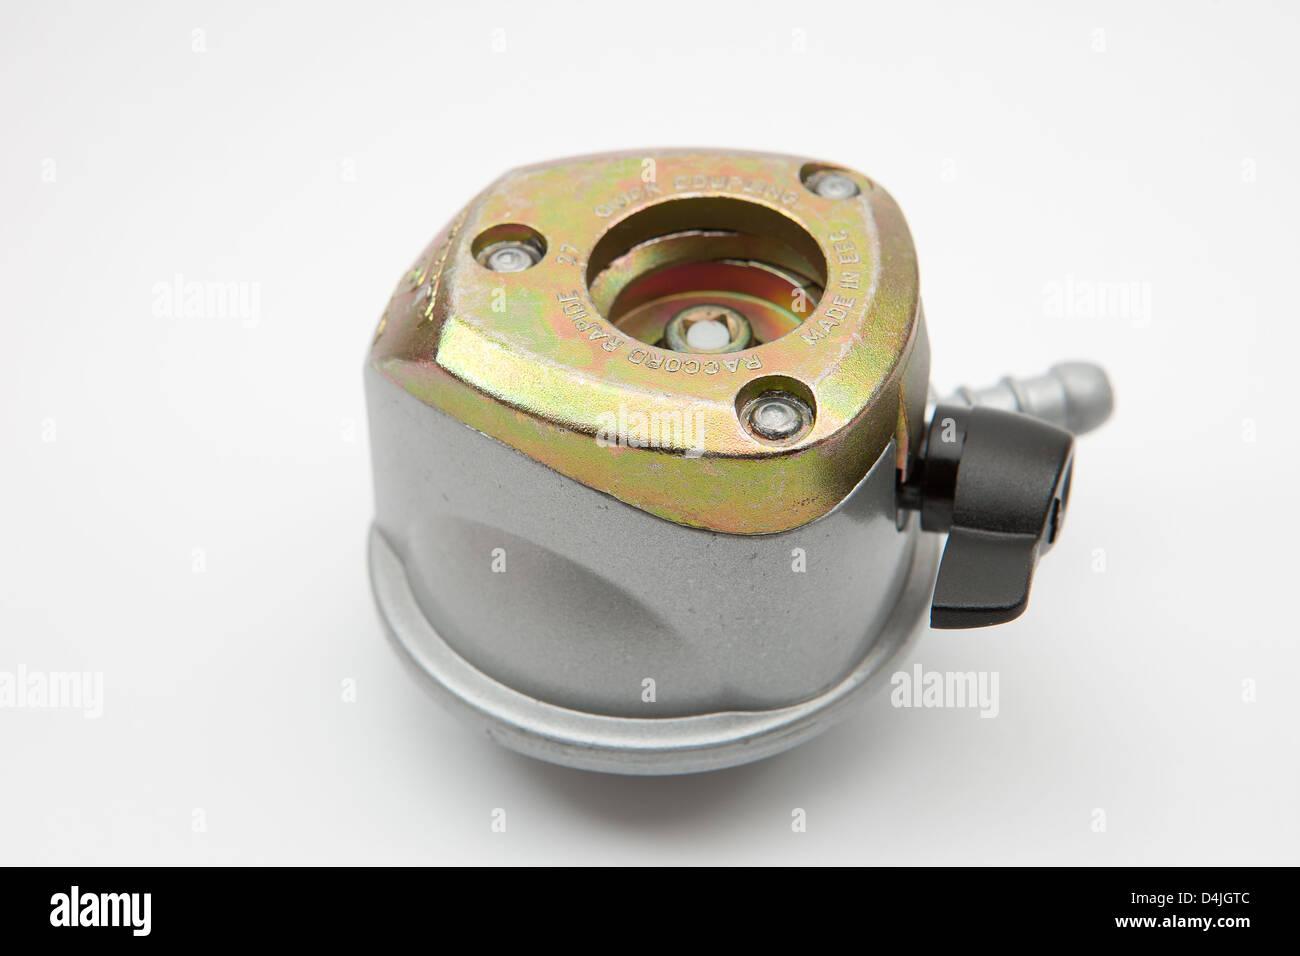 Propane gas regulator 37mbar 27mm en12864 quick-on - Stock Image